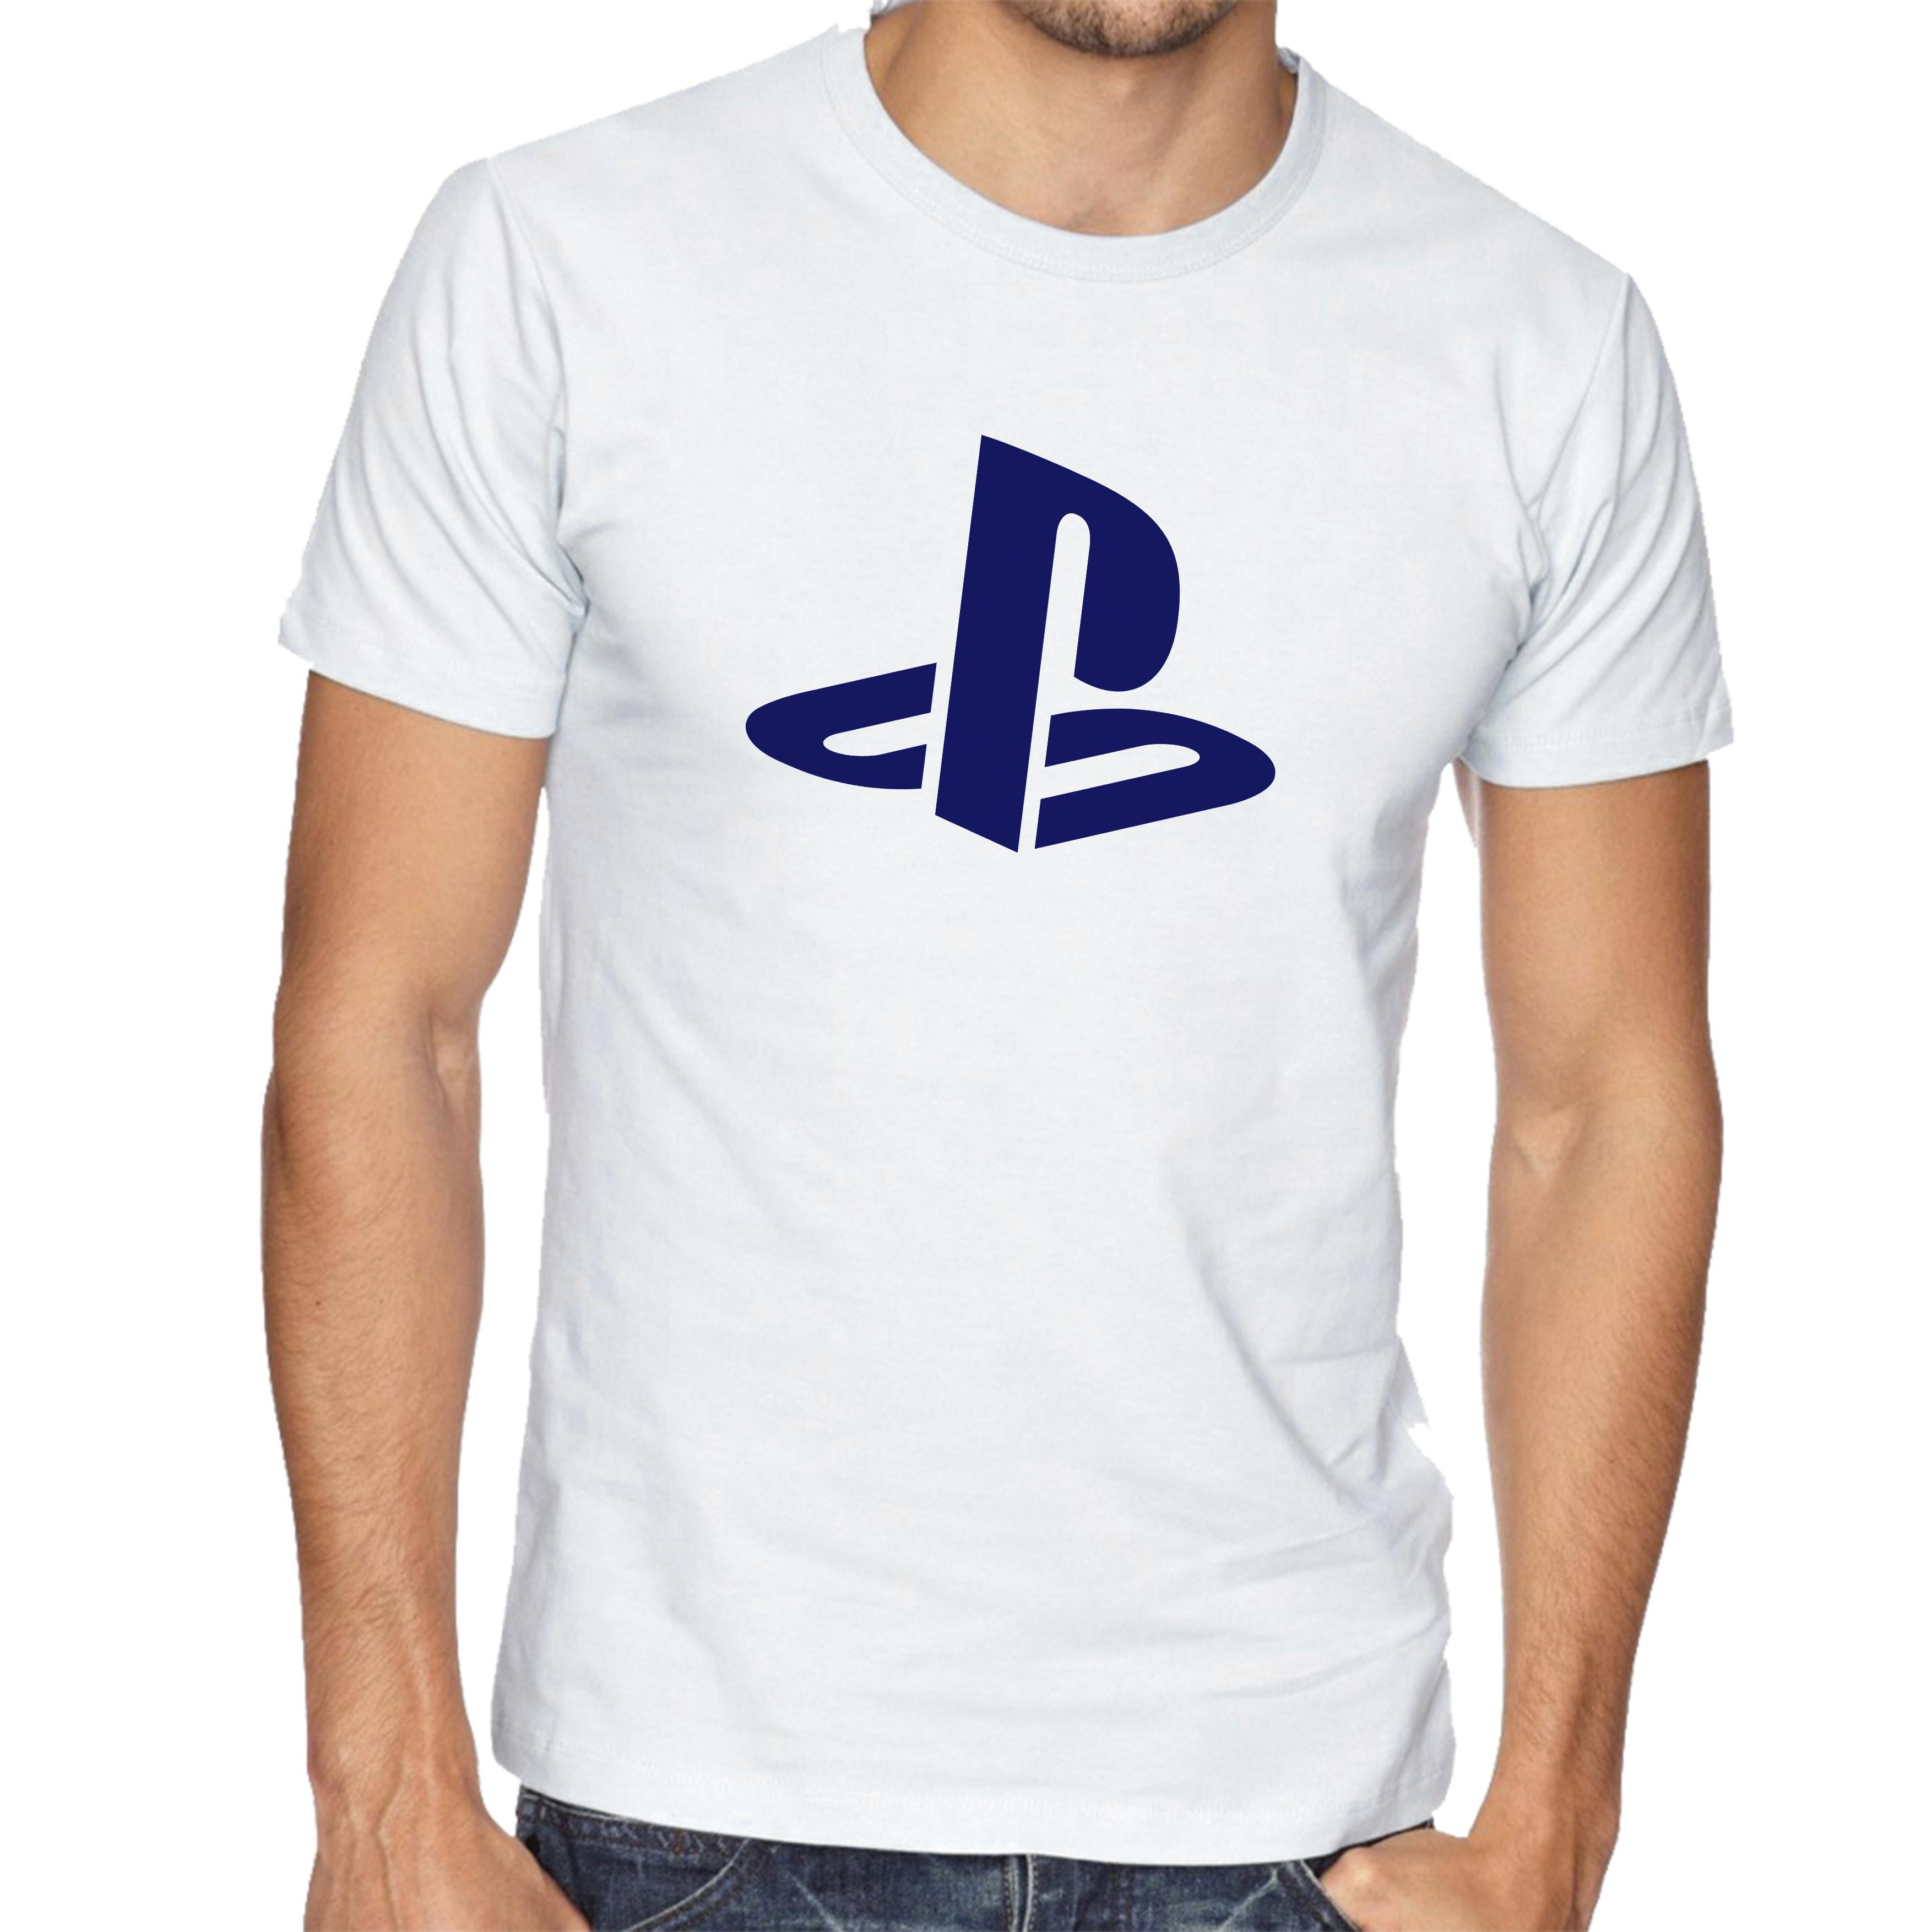 04fbf5588 Camiseta Logo Playstation 1